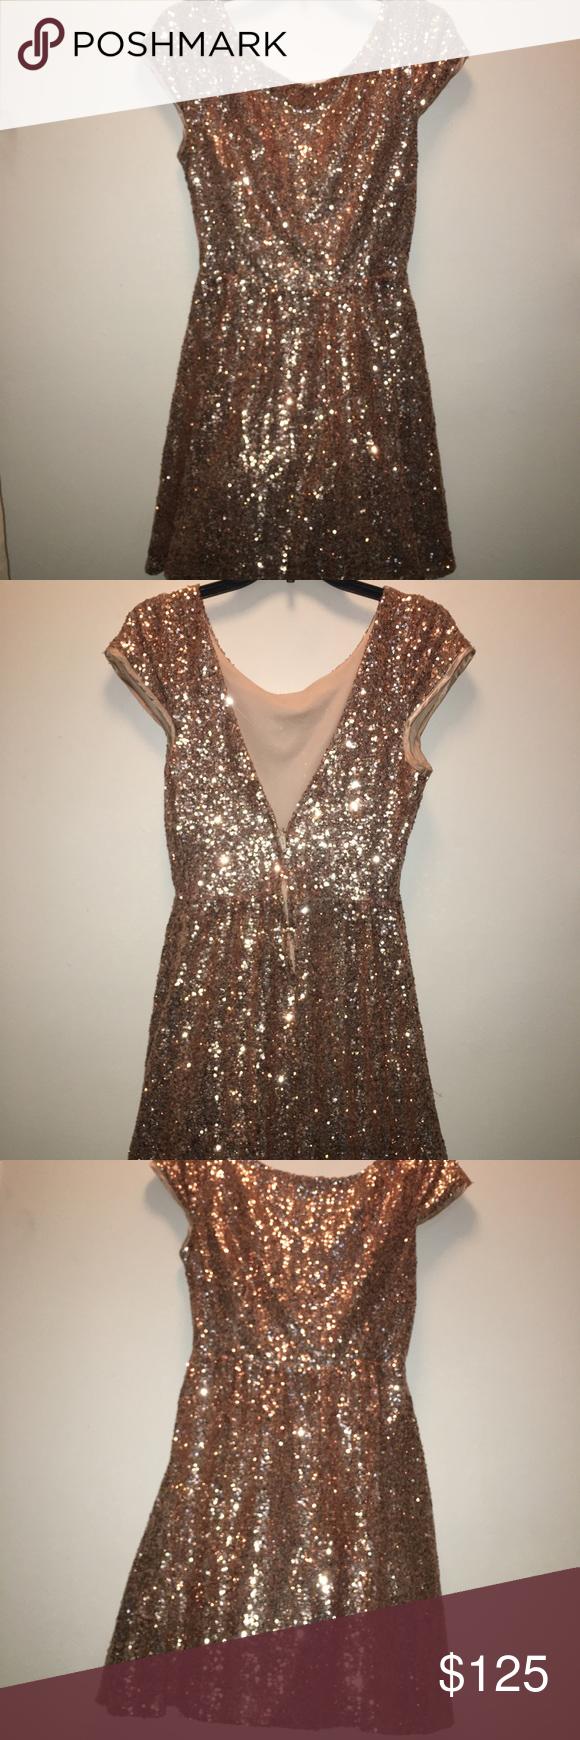 Windsor sequin prom dress windsor fc dress prom and